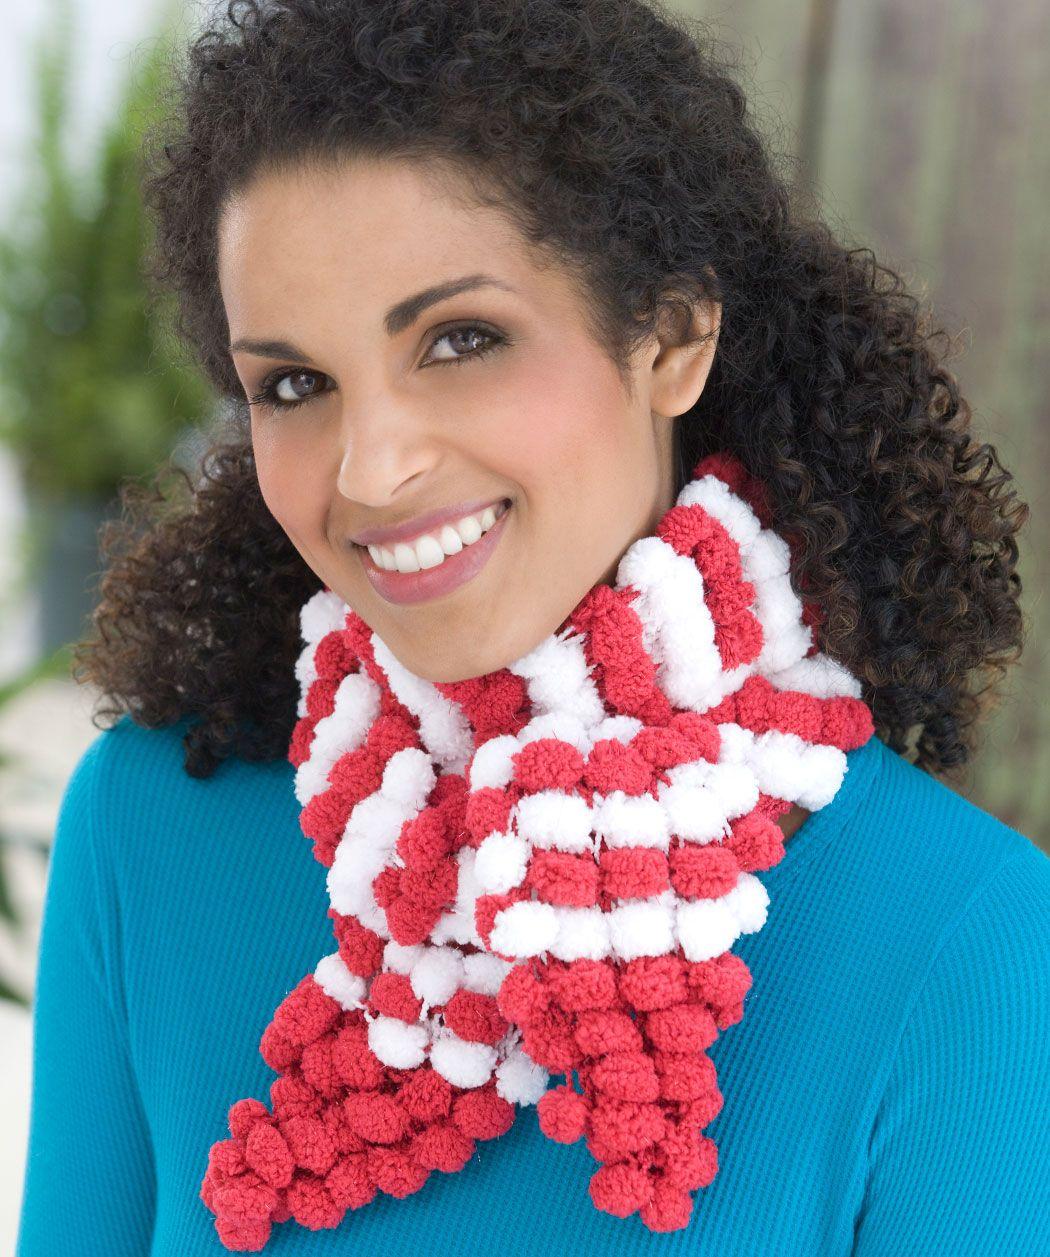 Candy Stripe Scarf Knitting Pattern